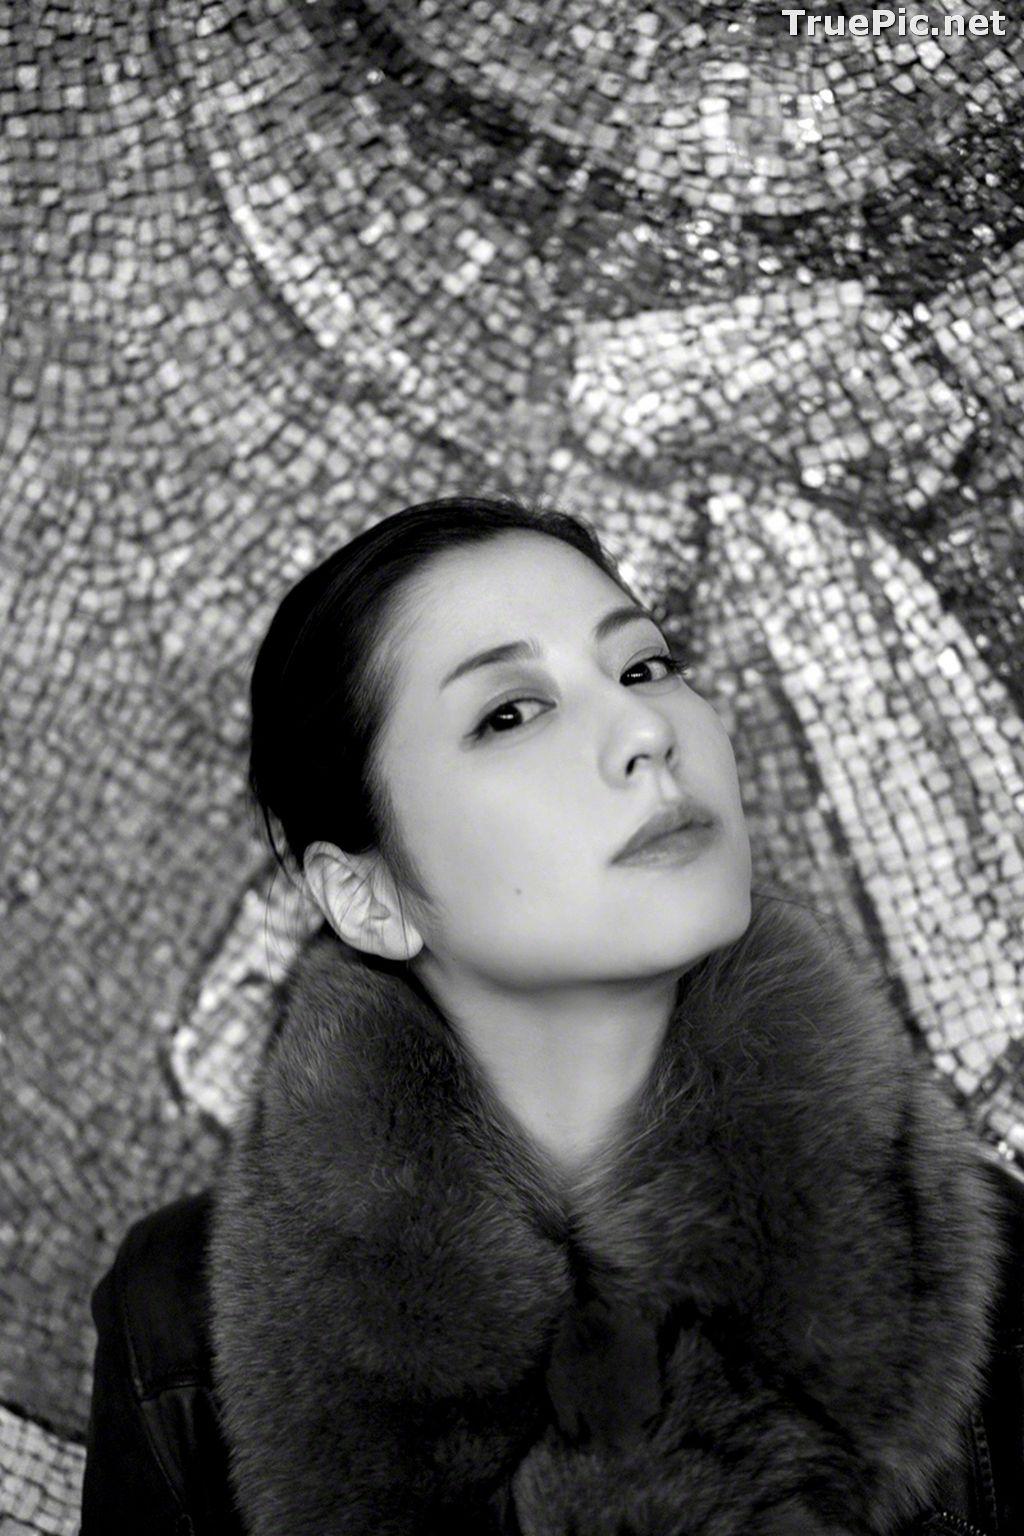 Image Wanibooks No.136 - Japanese Actress and Singer - Yumi Sugimoto - TruePic.net - Picture-3